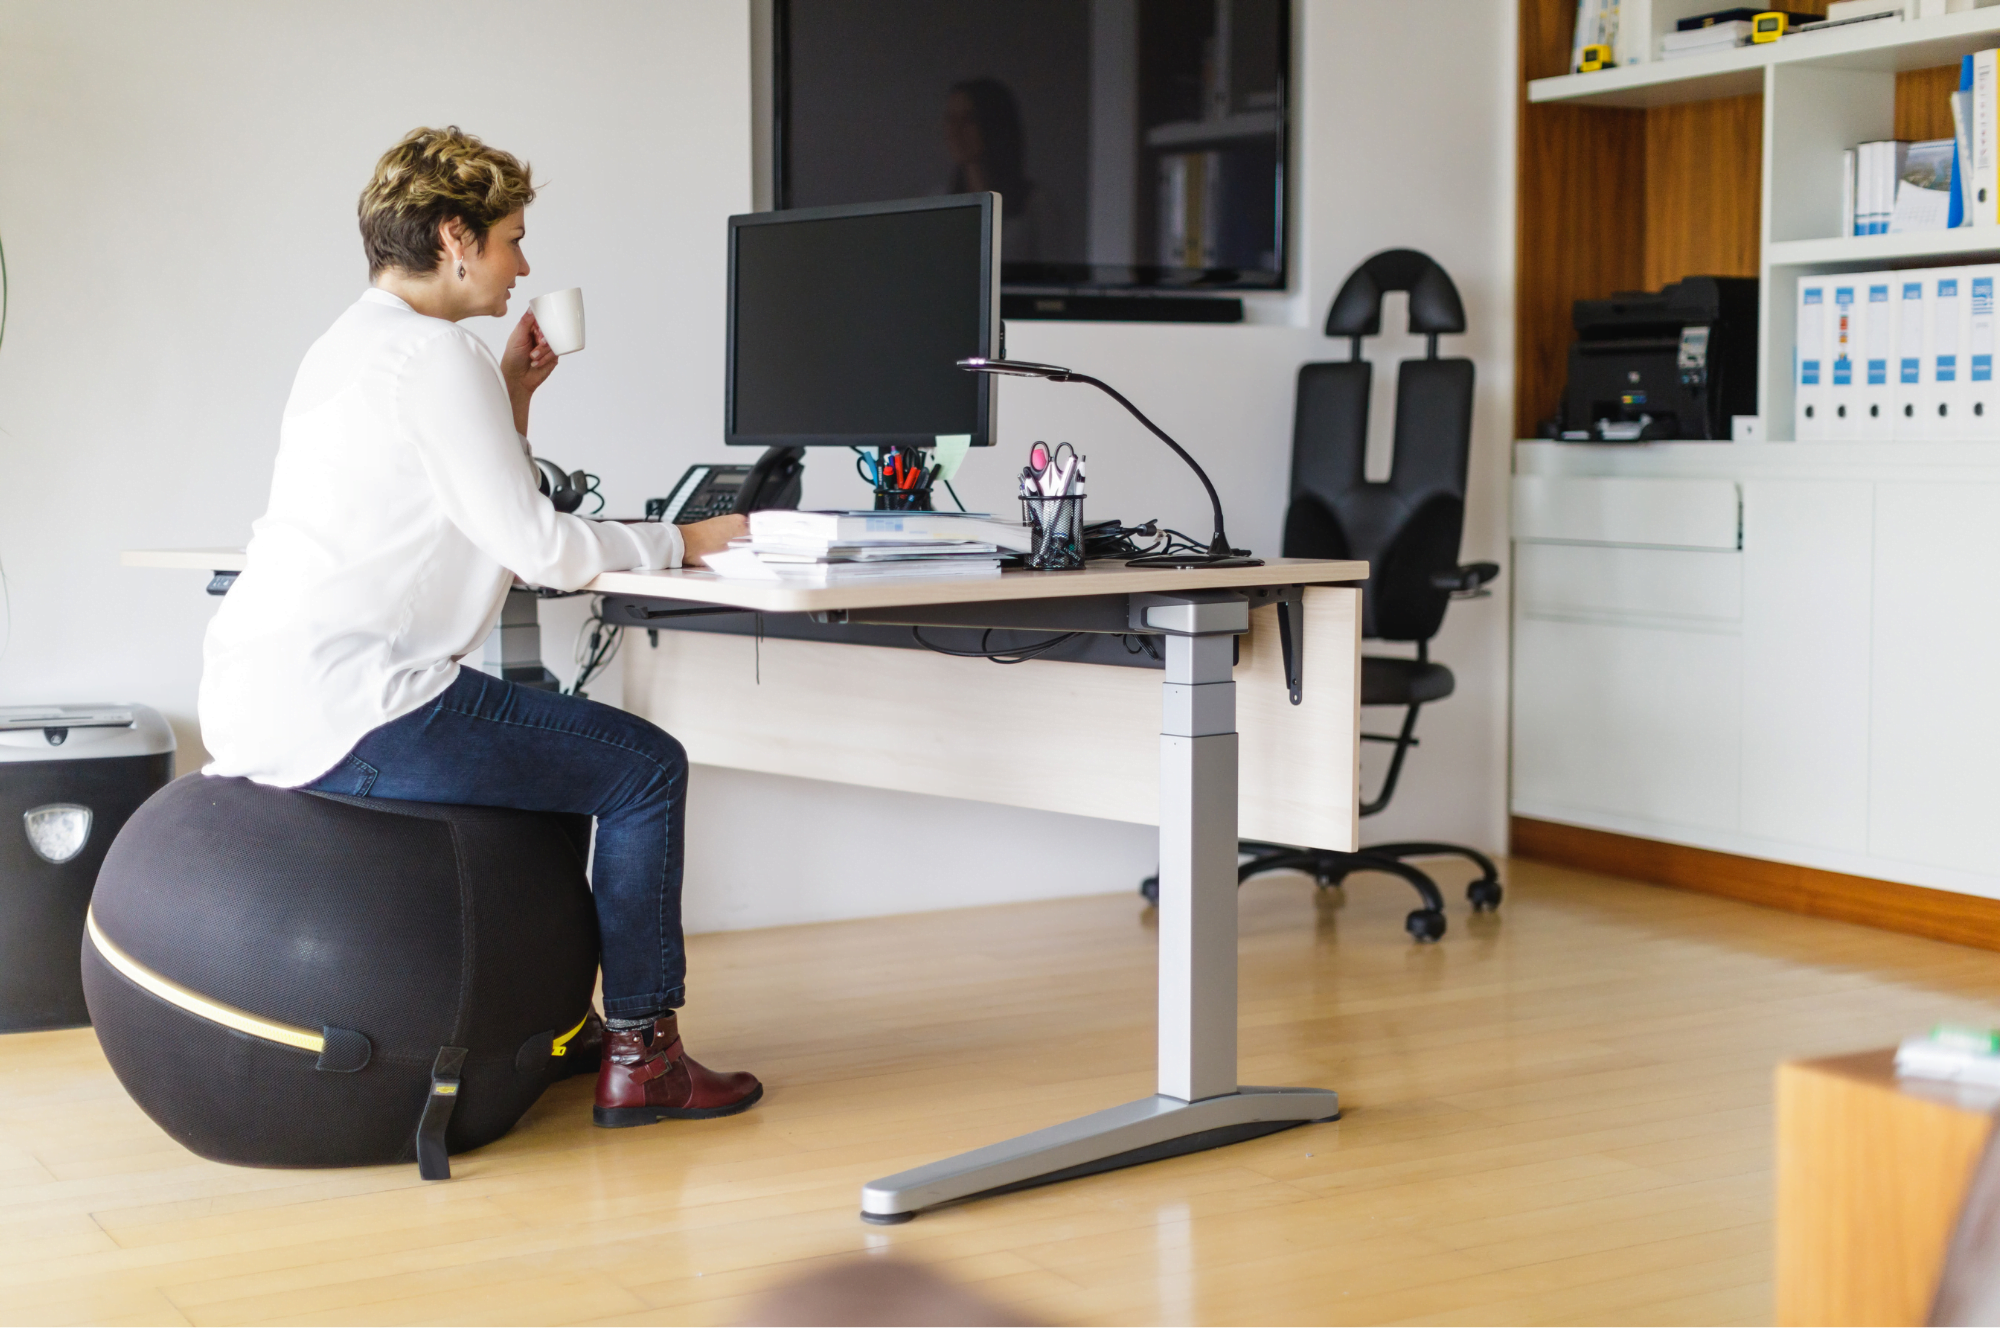 Do Stability Balls Make Good Ergonomic Office Chairs?